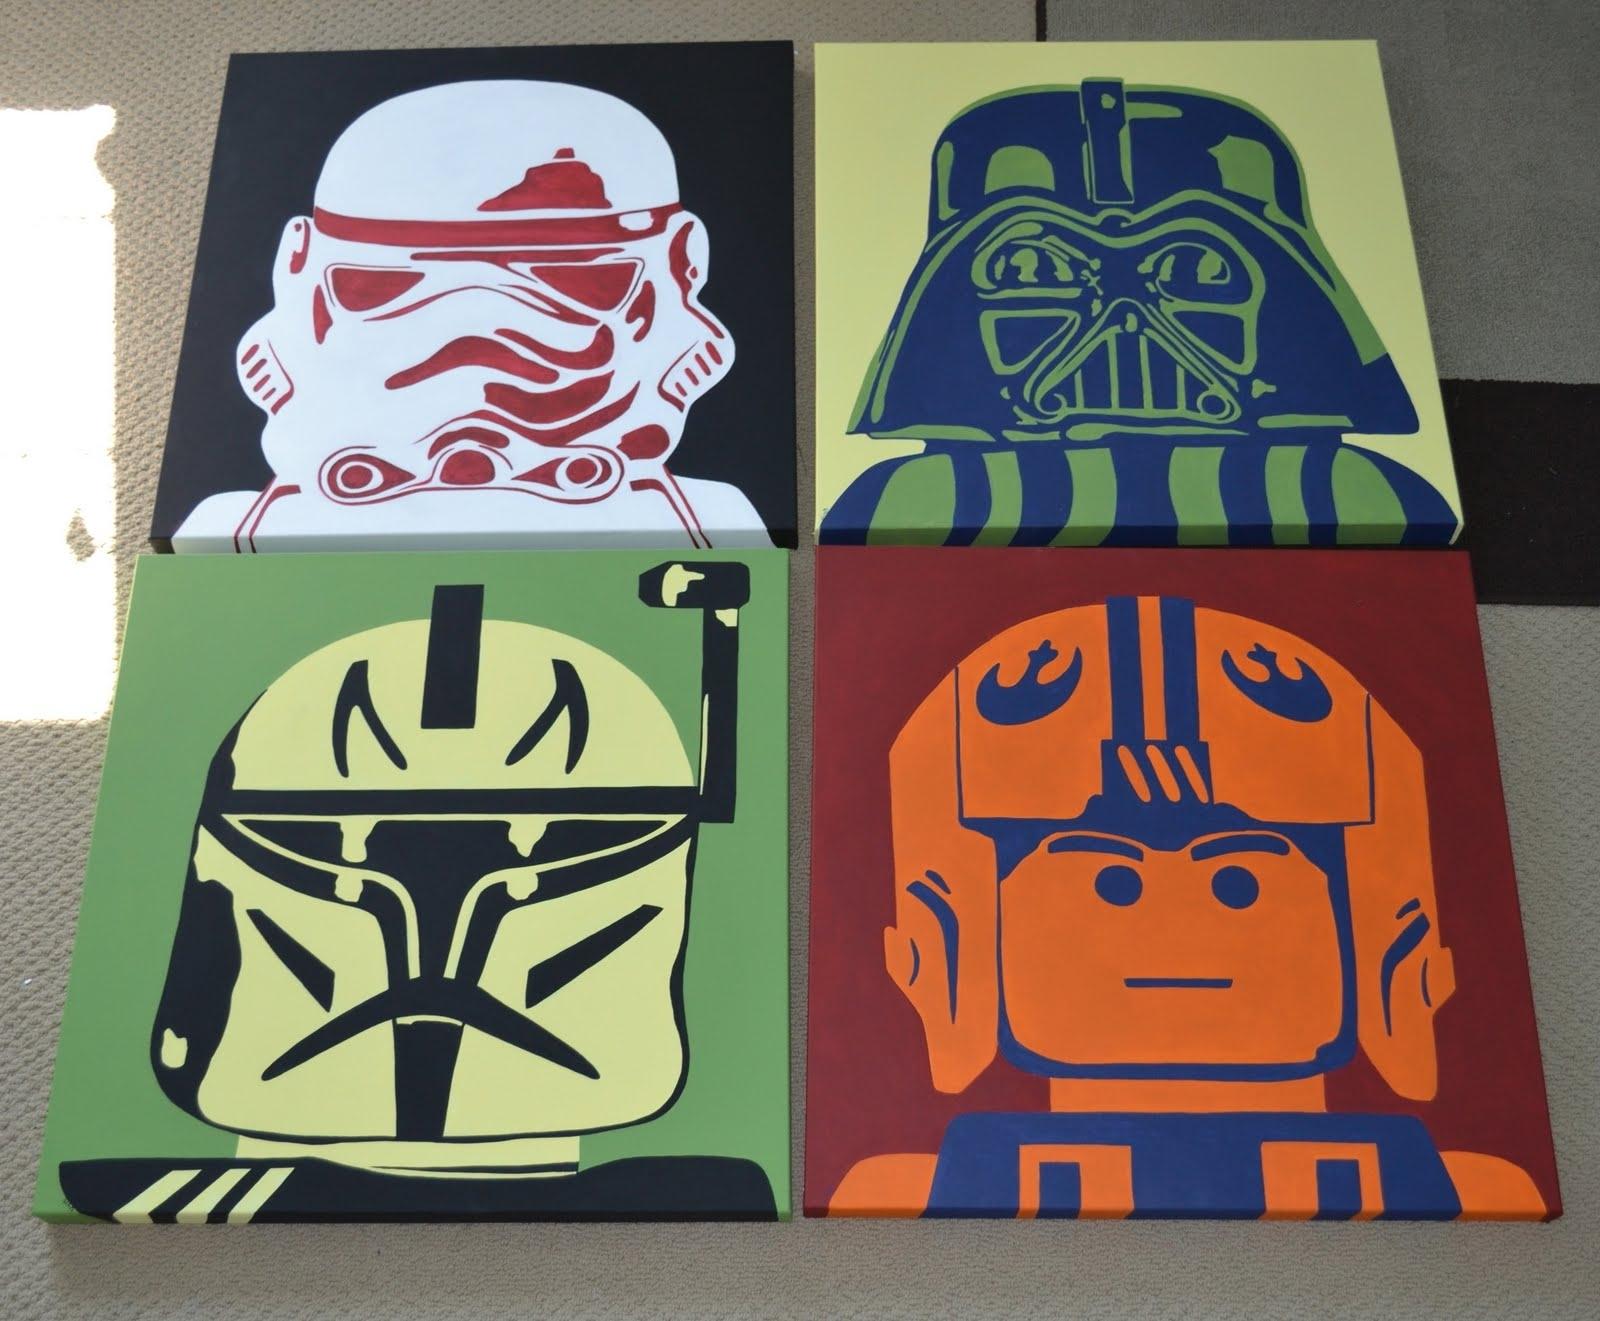 You're Artcorie Kline: Star Wars Legos Pop Art Intended For Preferred Lego Star Wars Wall Art (Gallery 2 of 15)